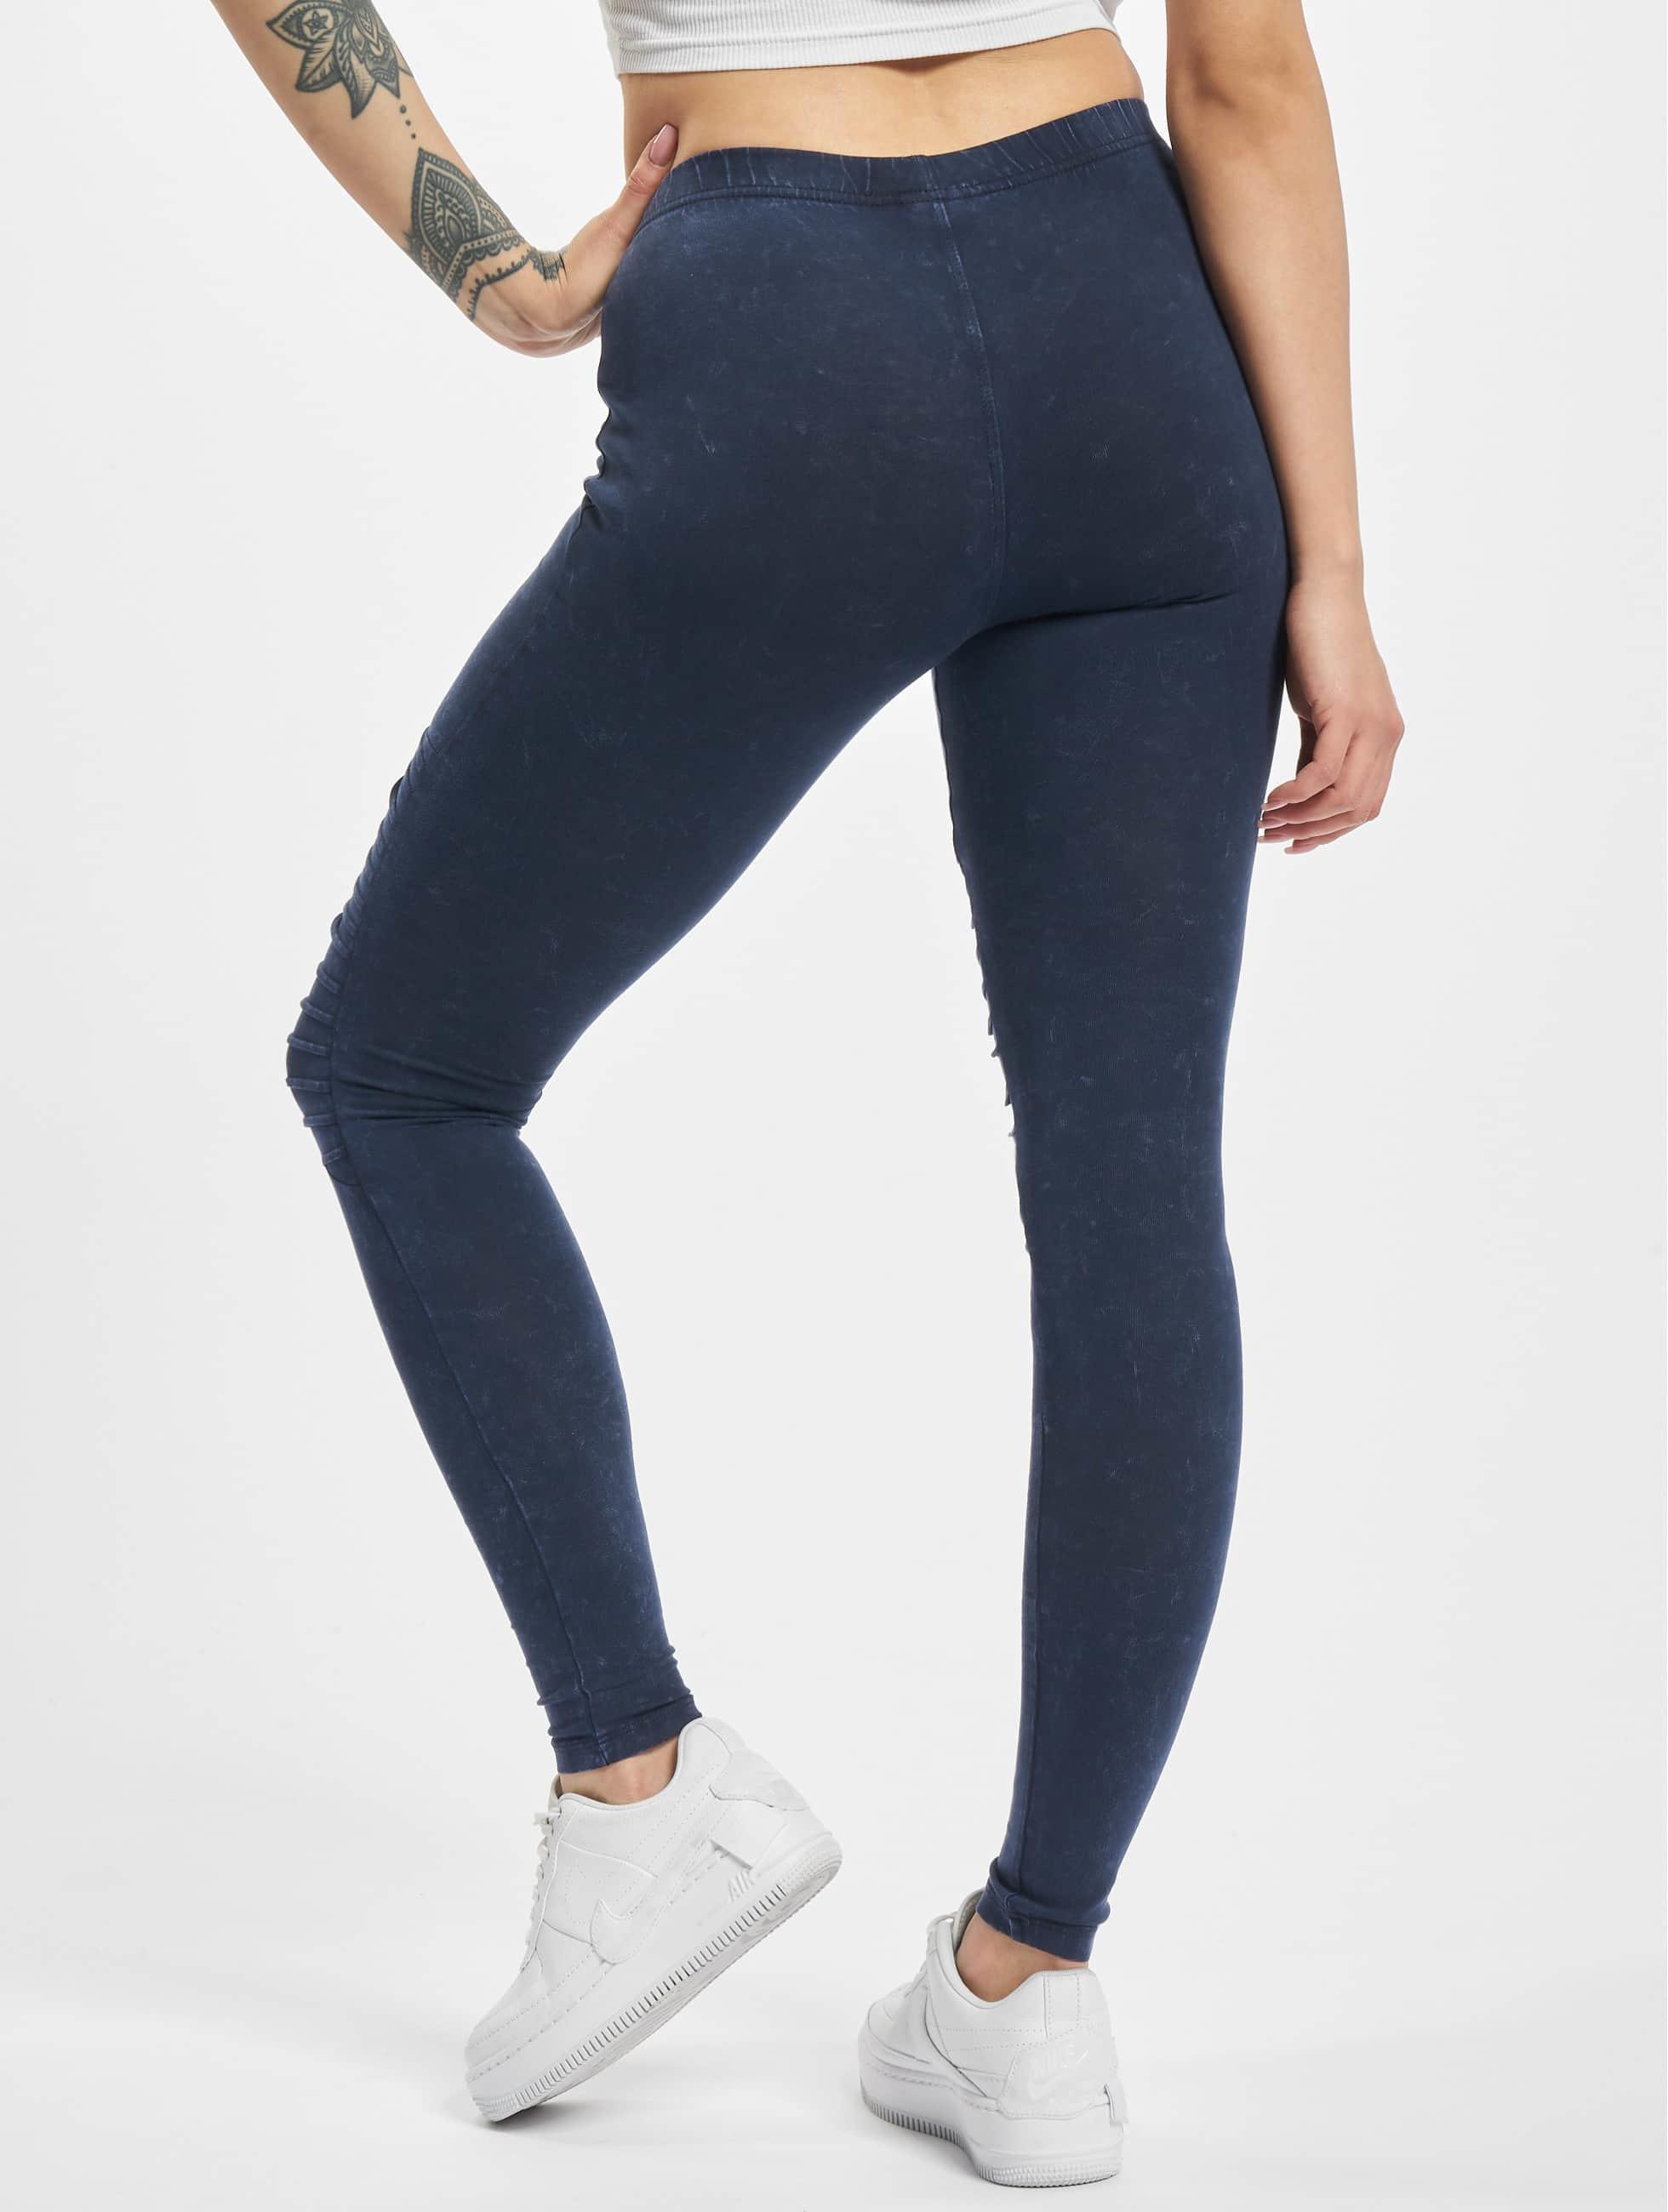 Urban Classics Legging Denim Jersey blauw